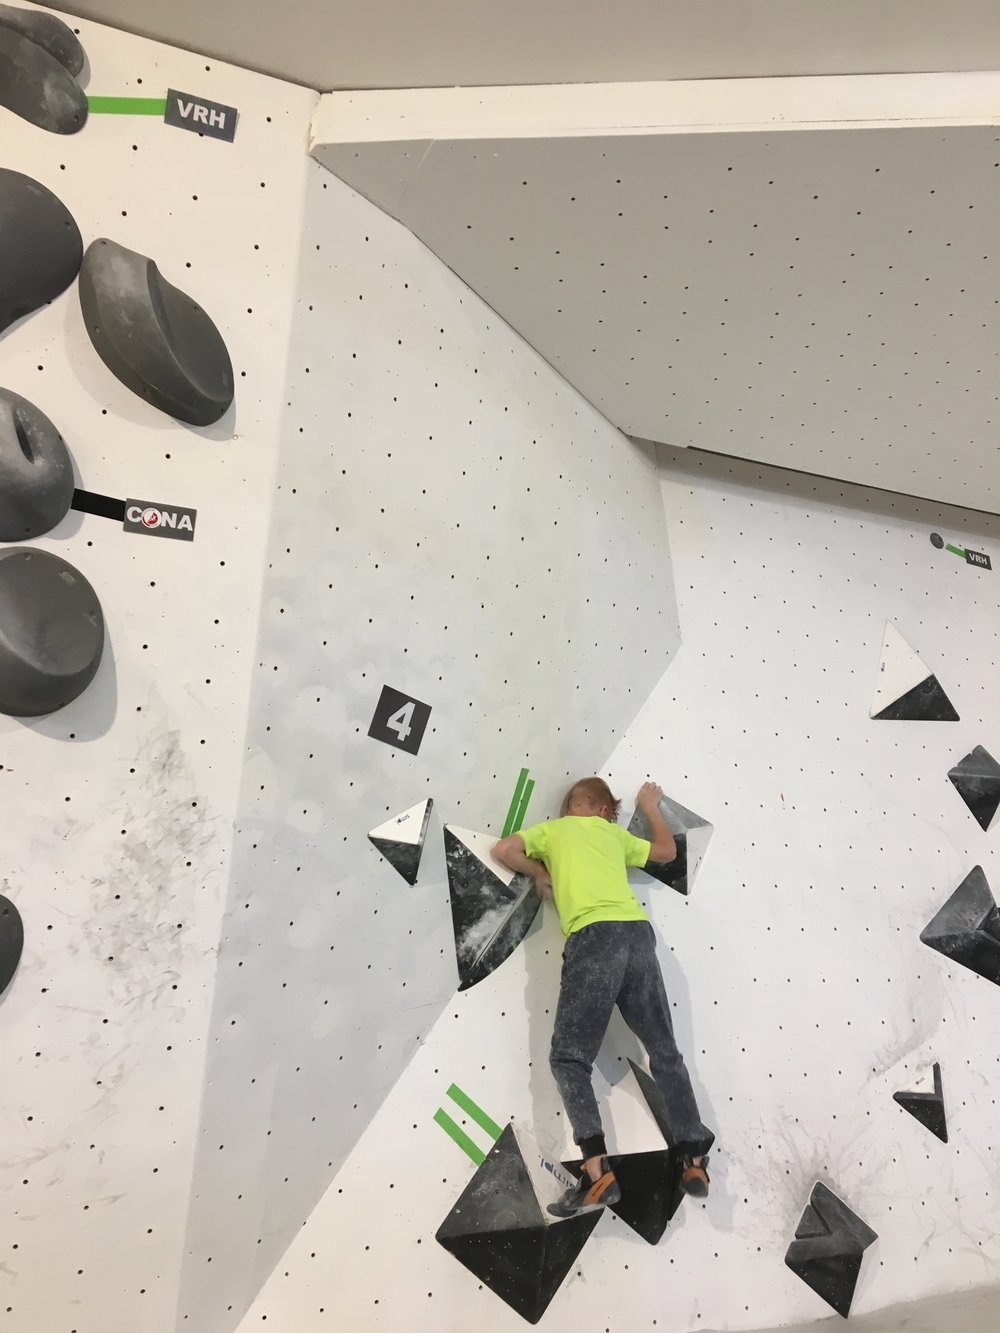 Plezalni tekma Grif Kamnik 2019_197.jpg